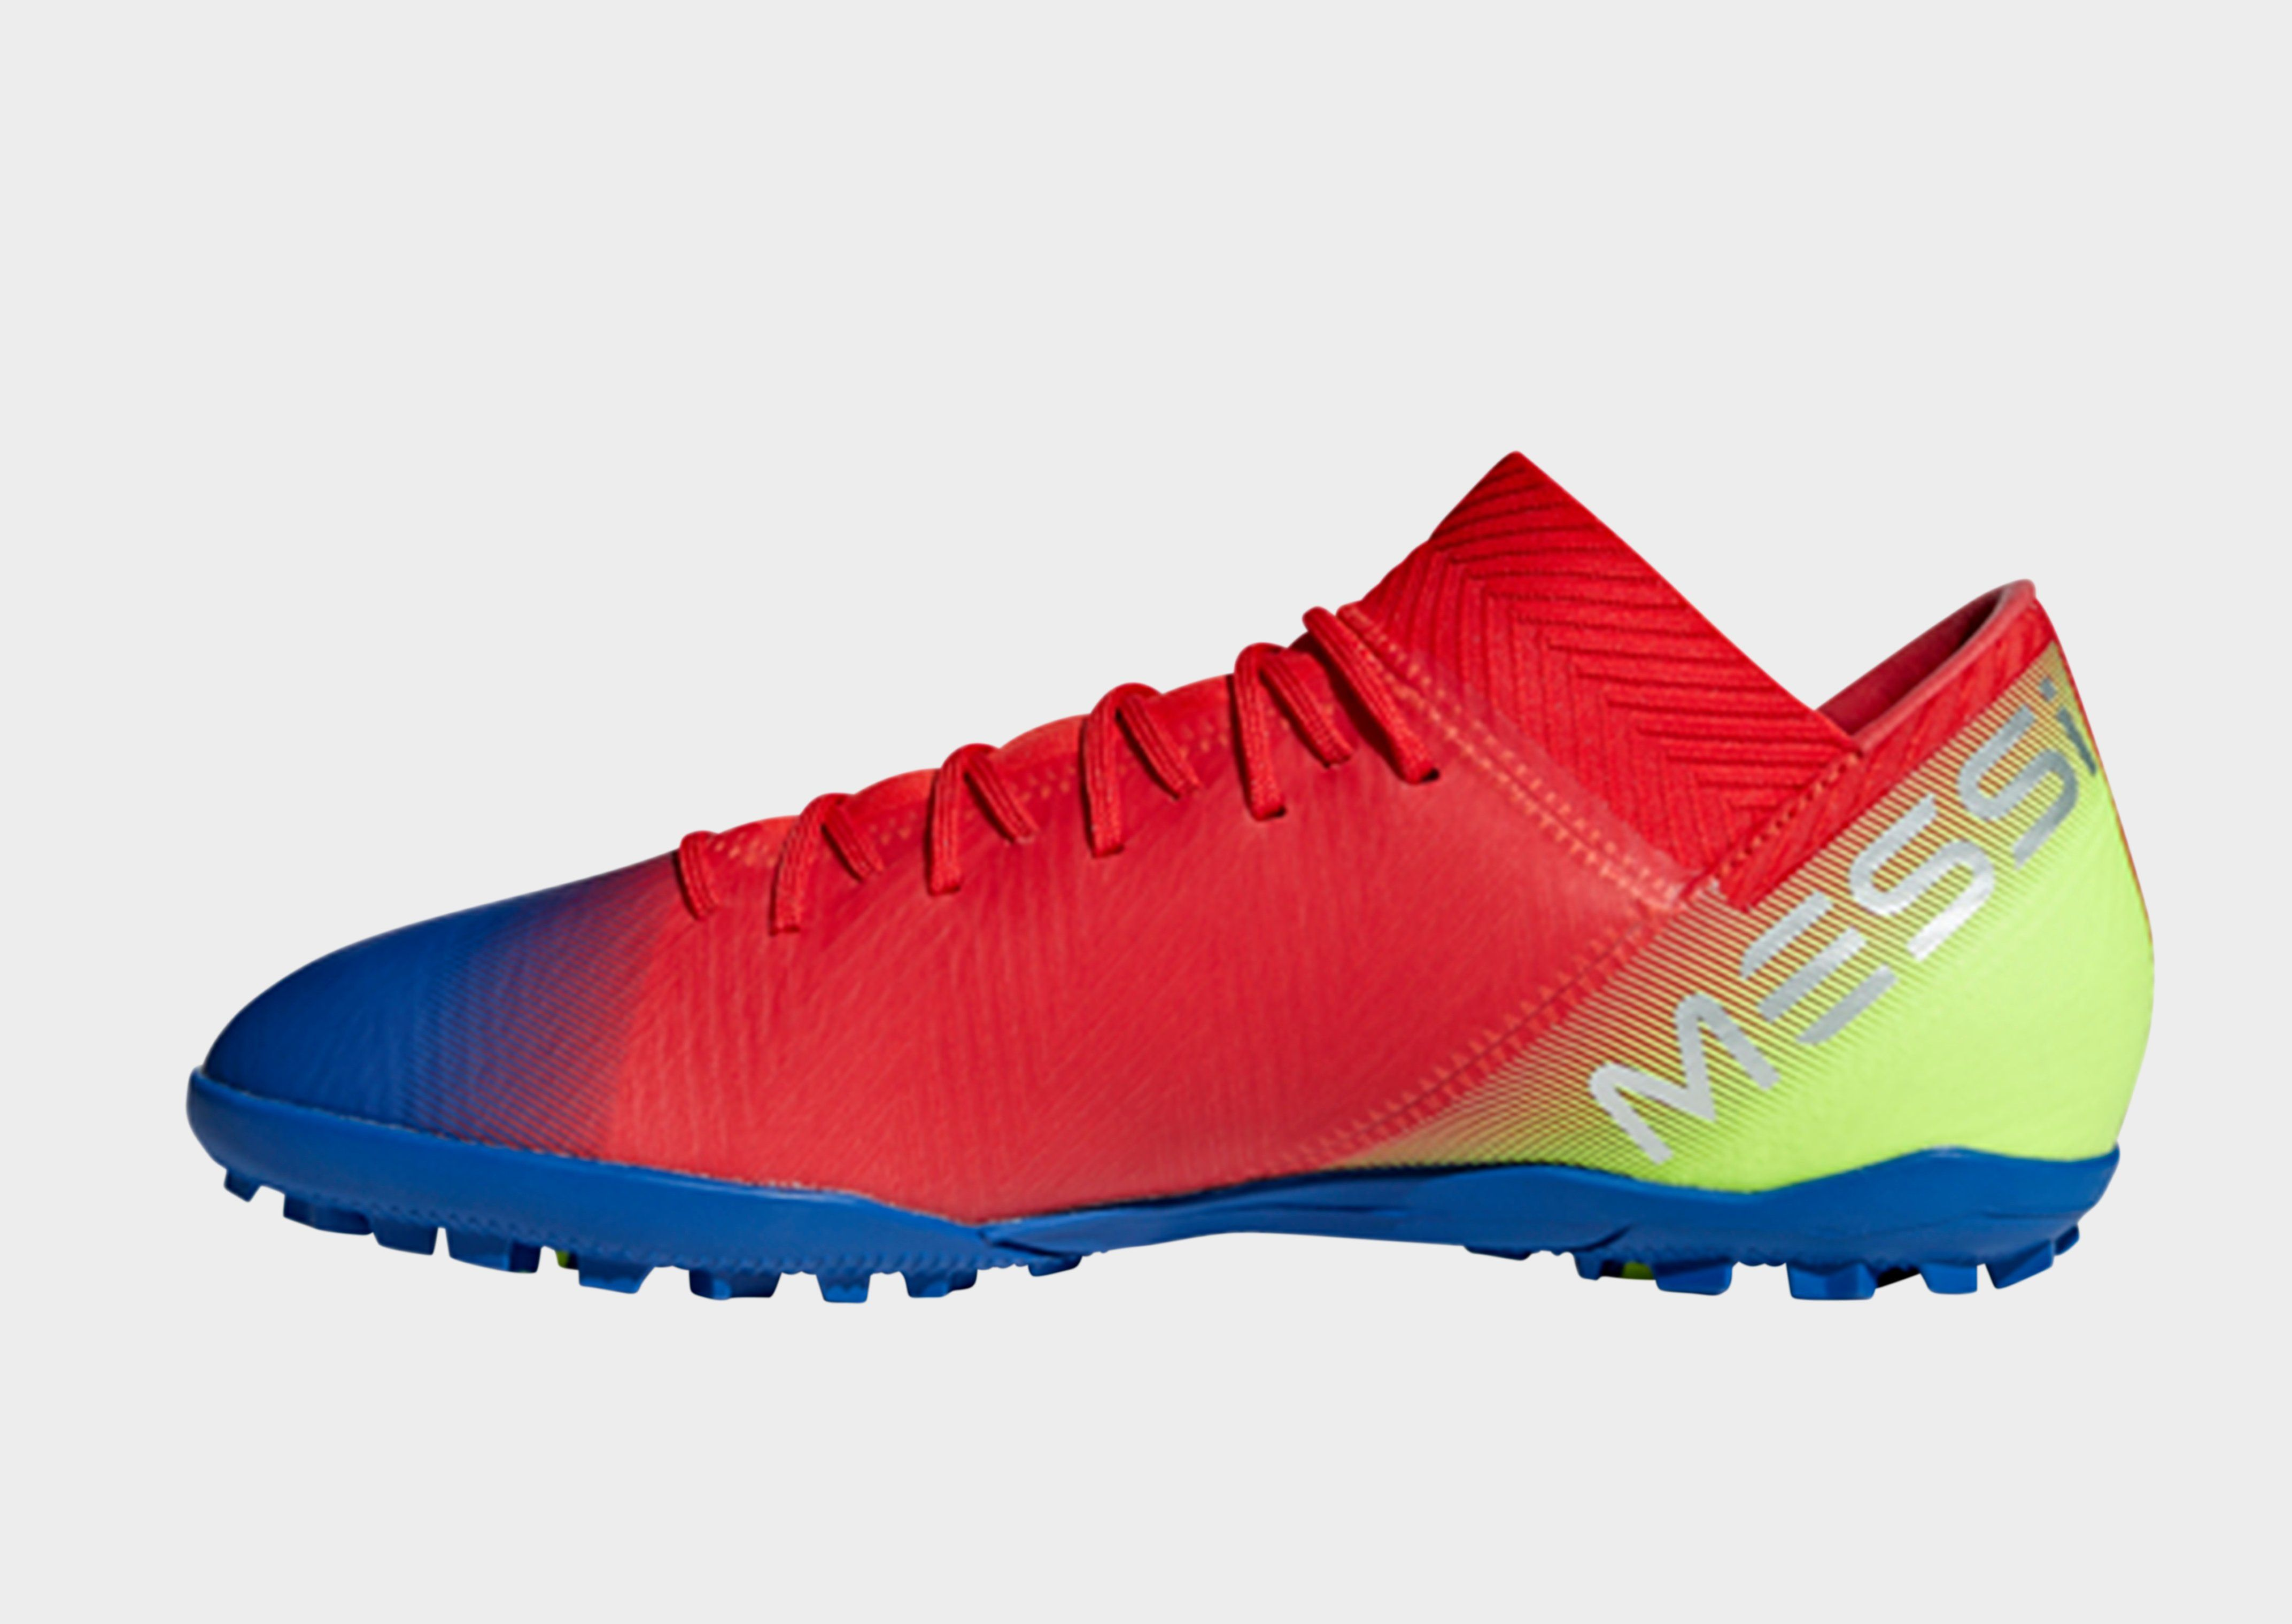 52ea13c90d83 ADIDAS Nemeziz Messi Tango 18.3 Turf Boots